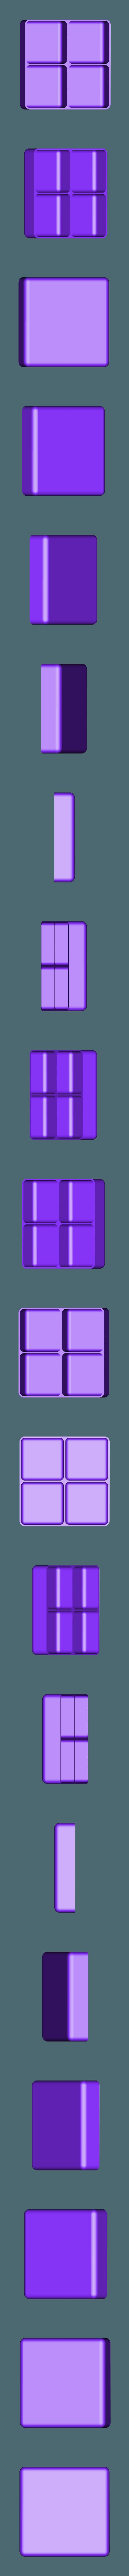 2_x_2_-_24mm_square.stl Download free SCAD file Customizable Square Trays • 3D printer design, WalterHsiao